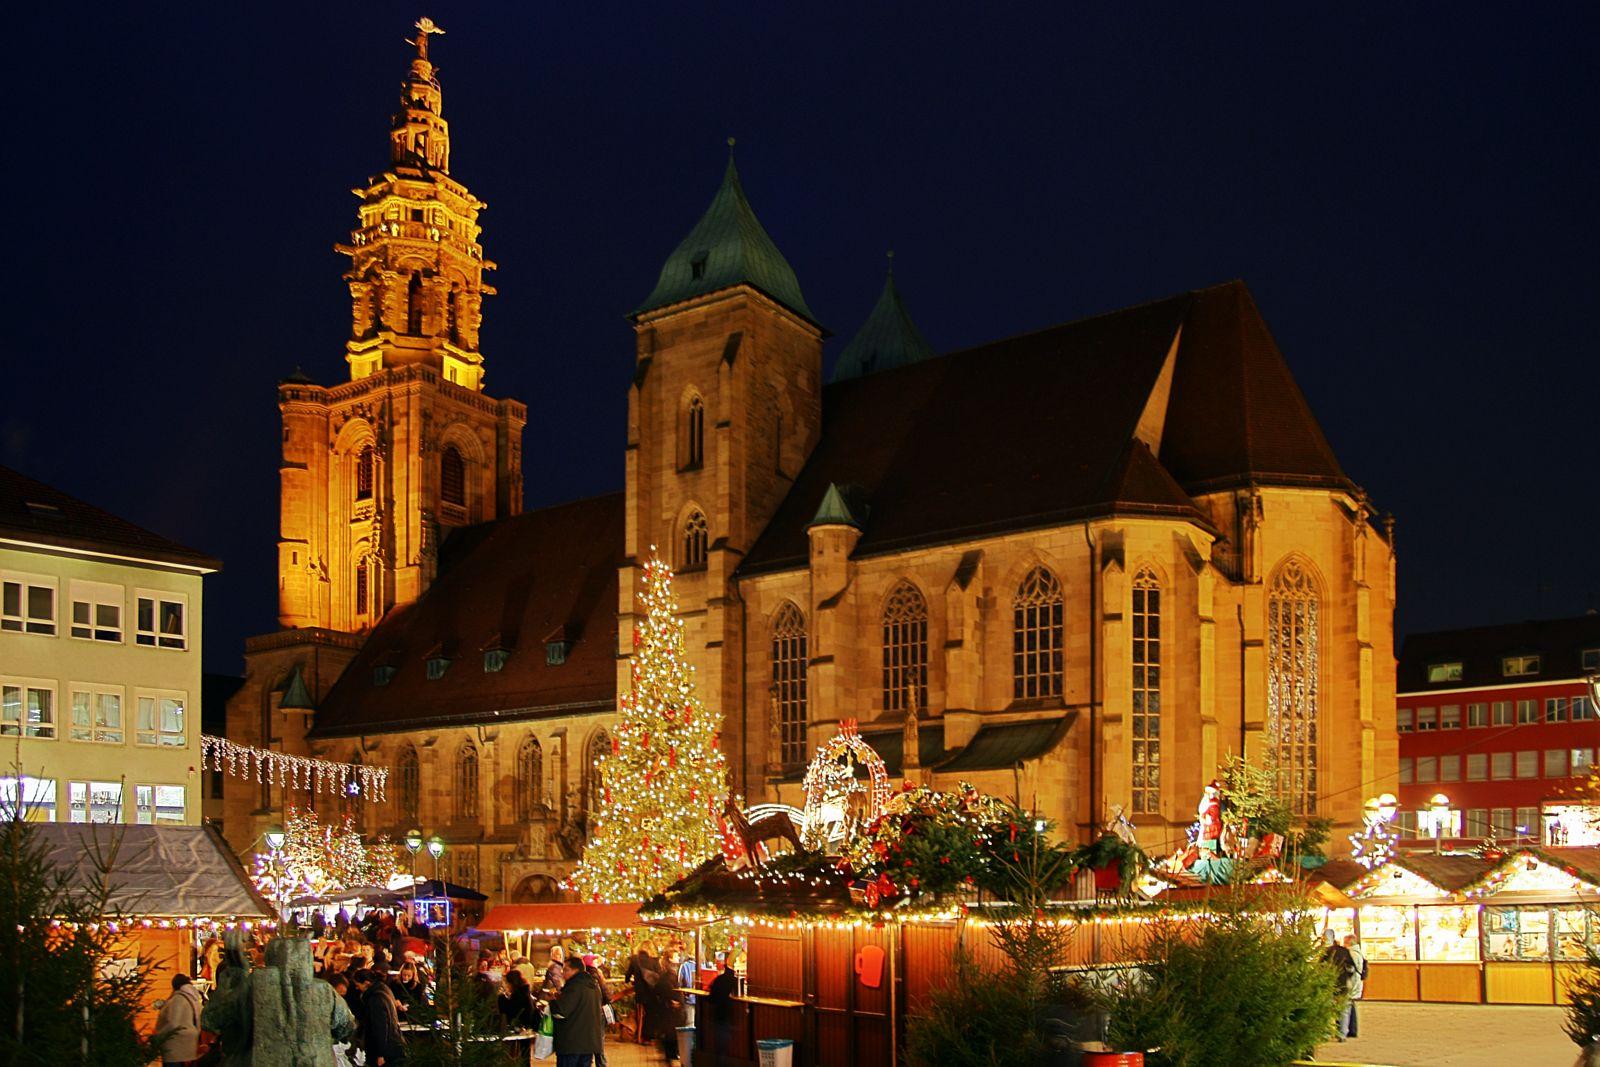 Weihnachtsmarkt Heilbronn.File Heilbronn Weihnachtsmarkt 2009 3 Jpg Wikimedia Commons